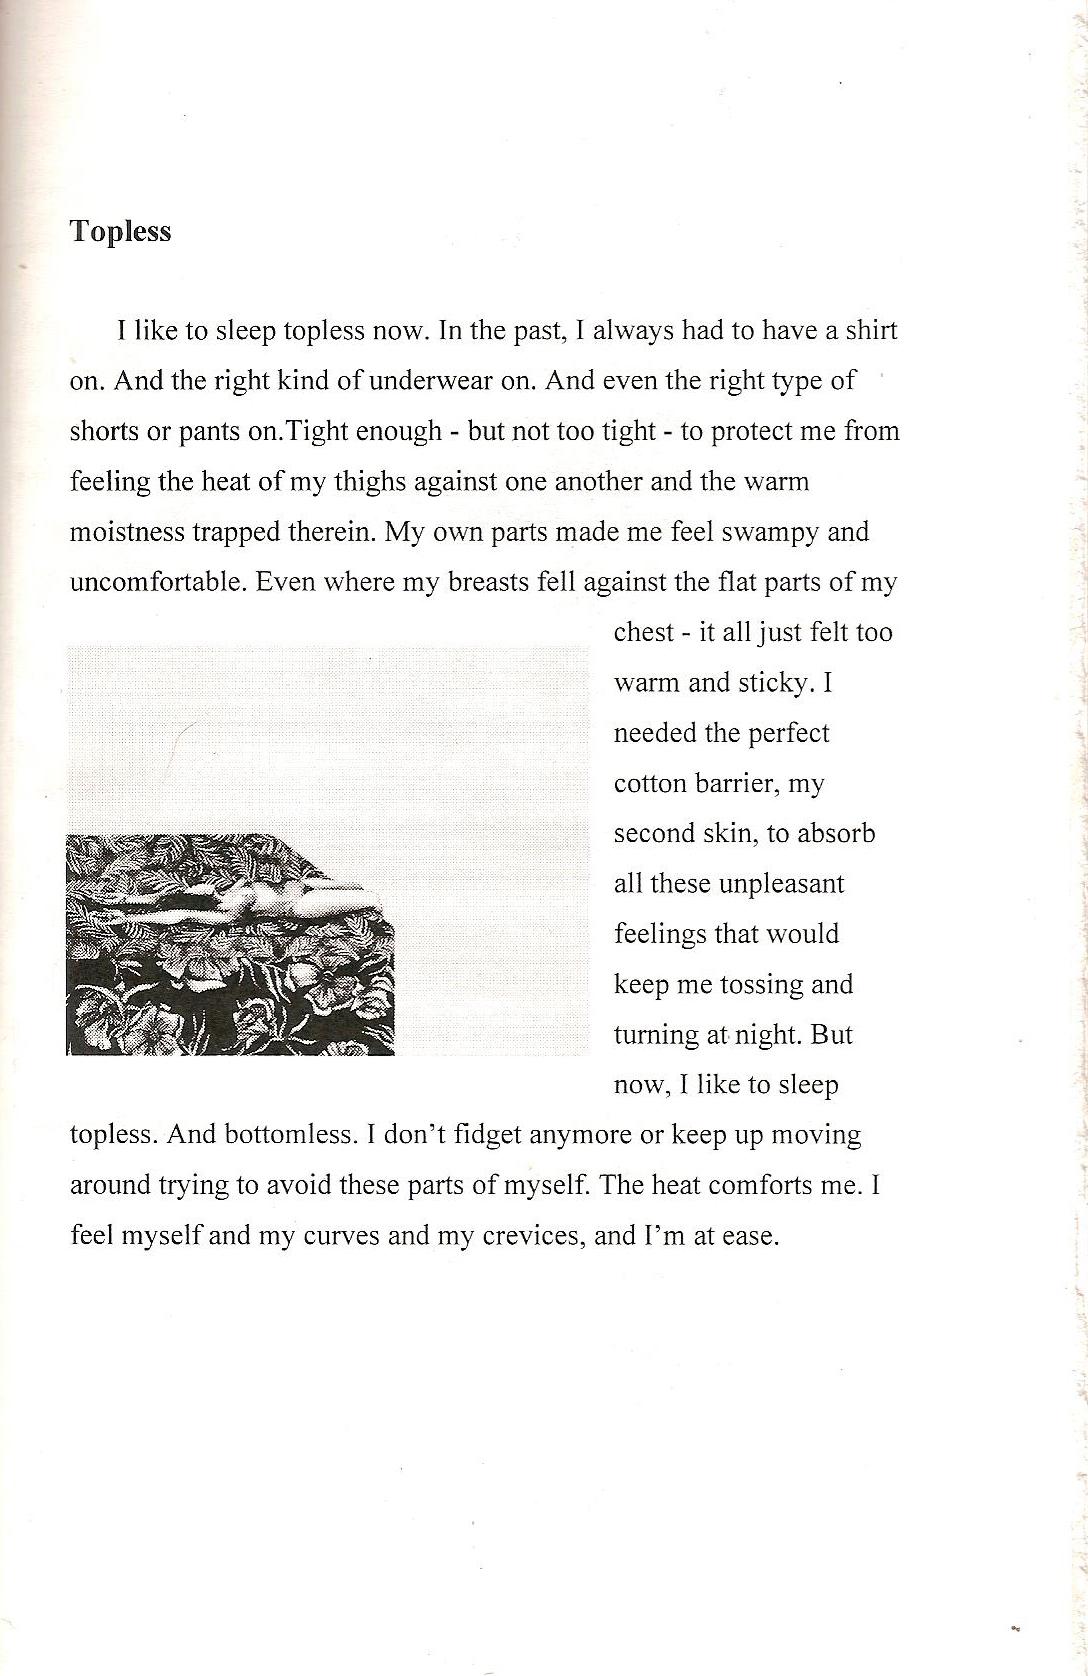 pg13.jpeg